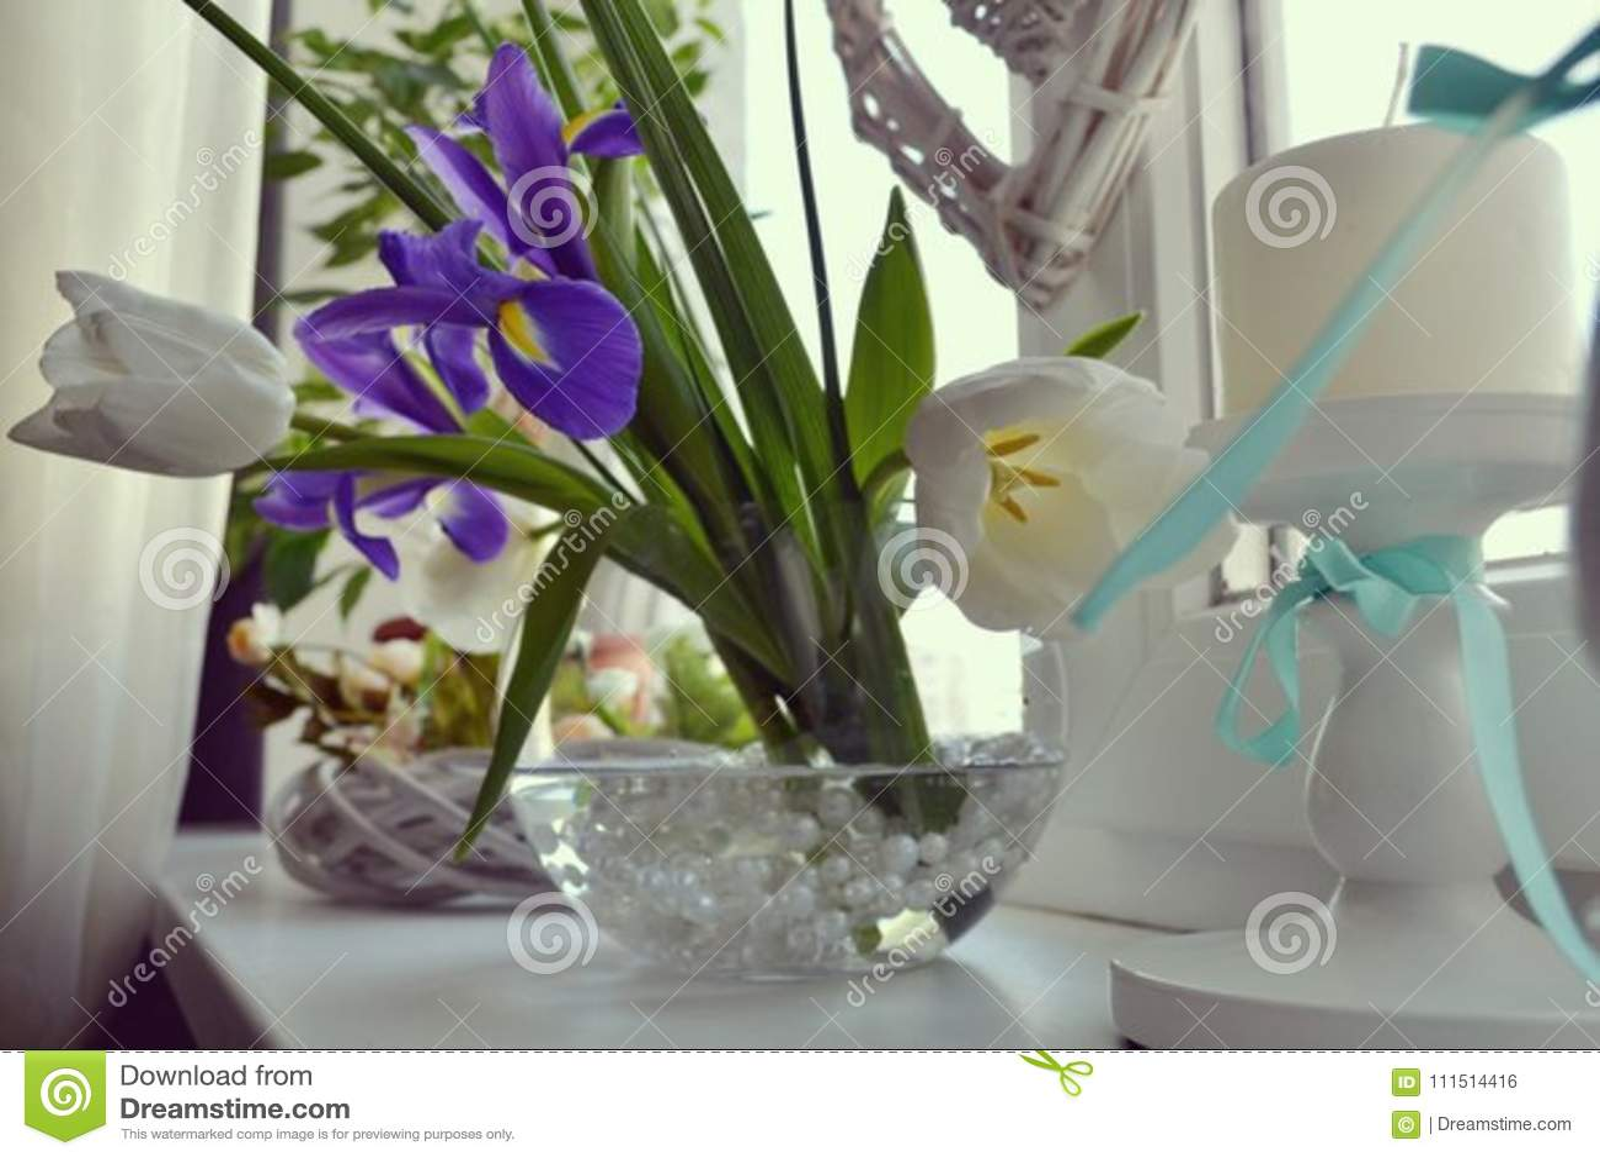 Womens favorite spring flowers stock photo image of fragrances download womens favorite spring flowers stock photo image of fragrances ball mightylinksfo